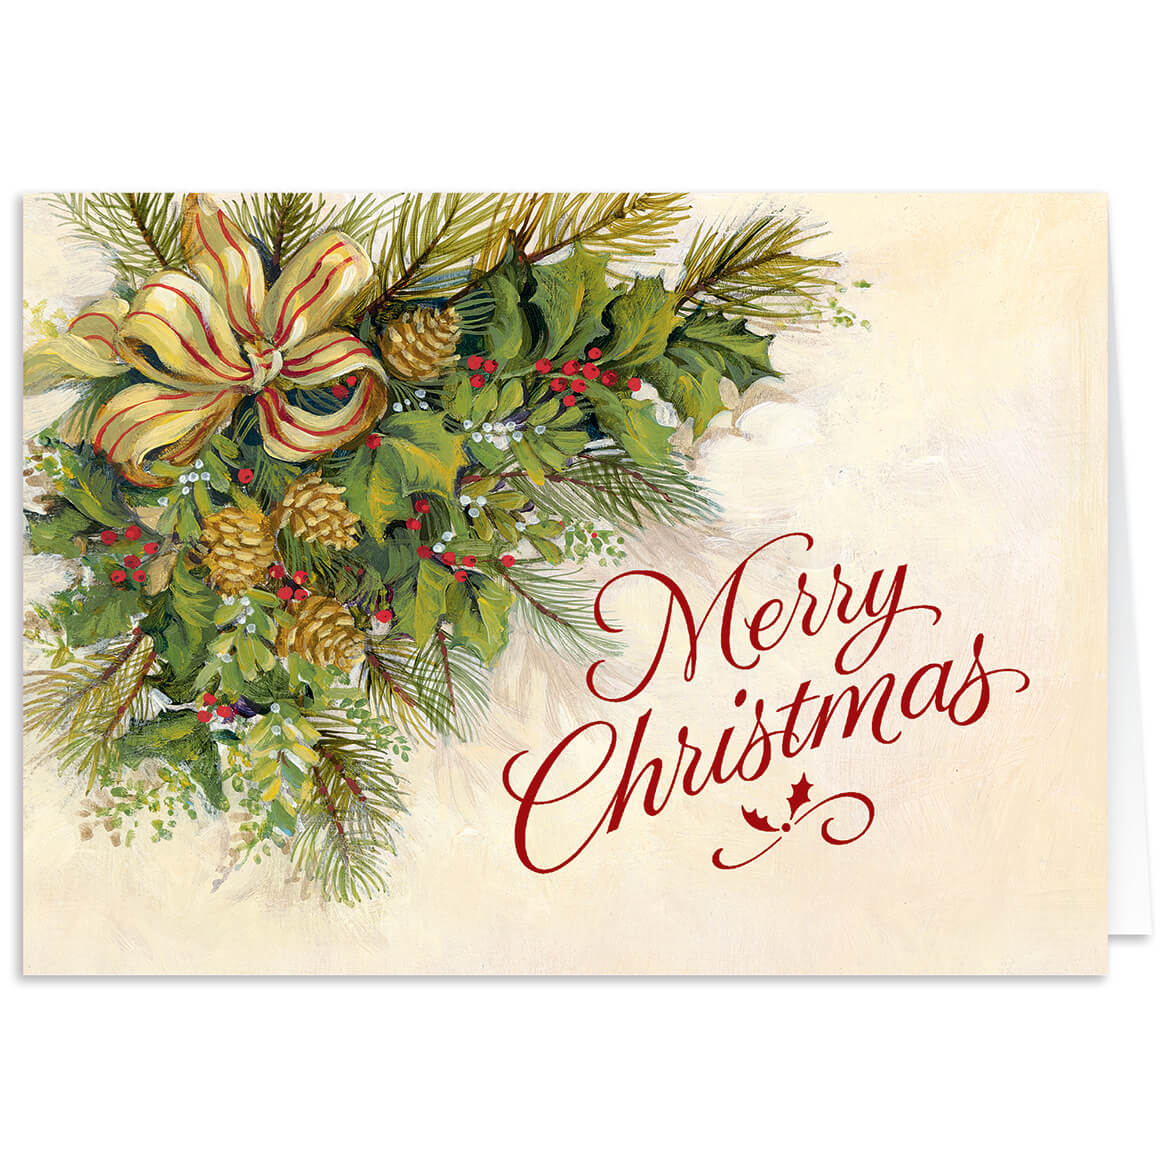 Christmas Greenery Images.Personalized Christmas Greenery Christmas Card Set Of 20